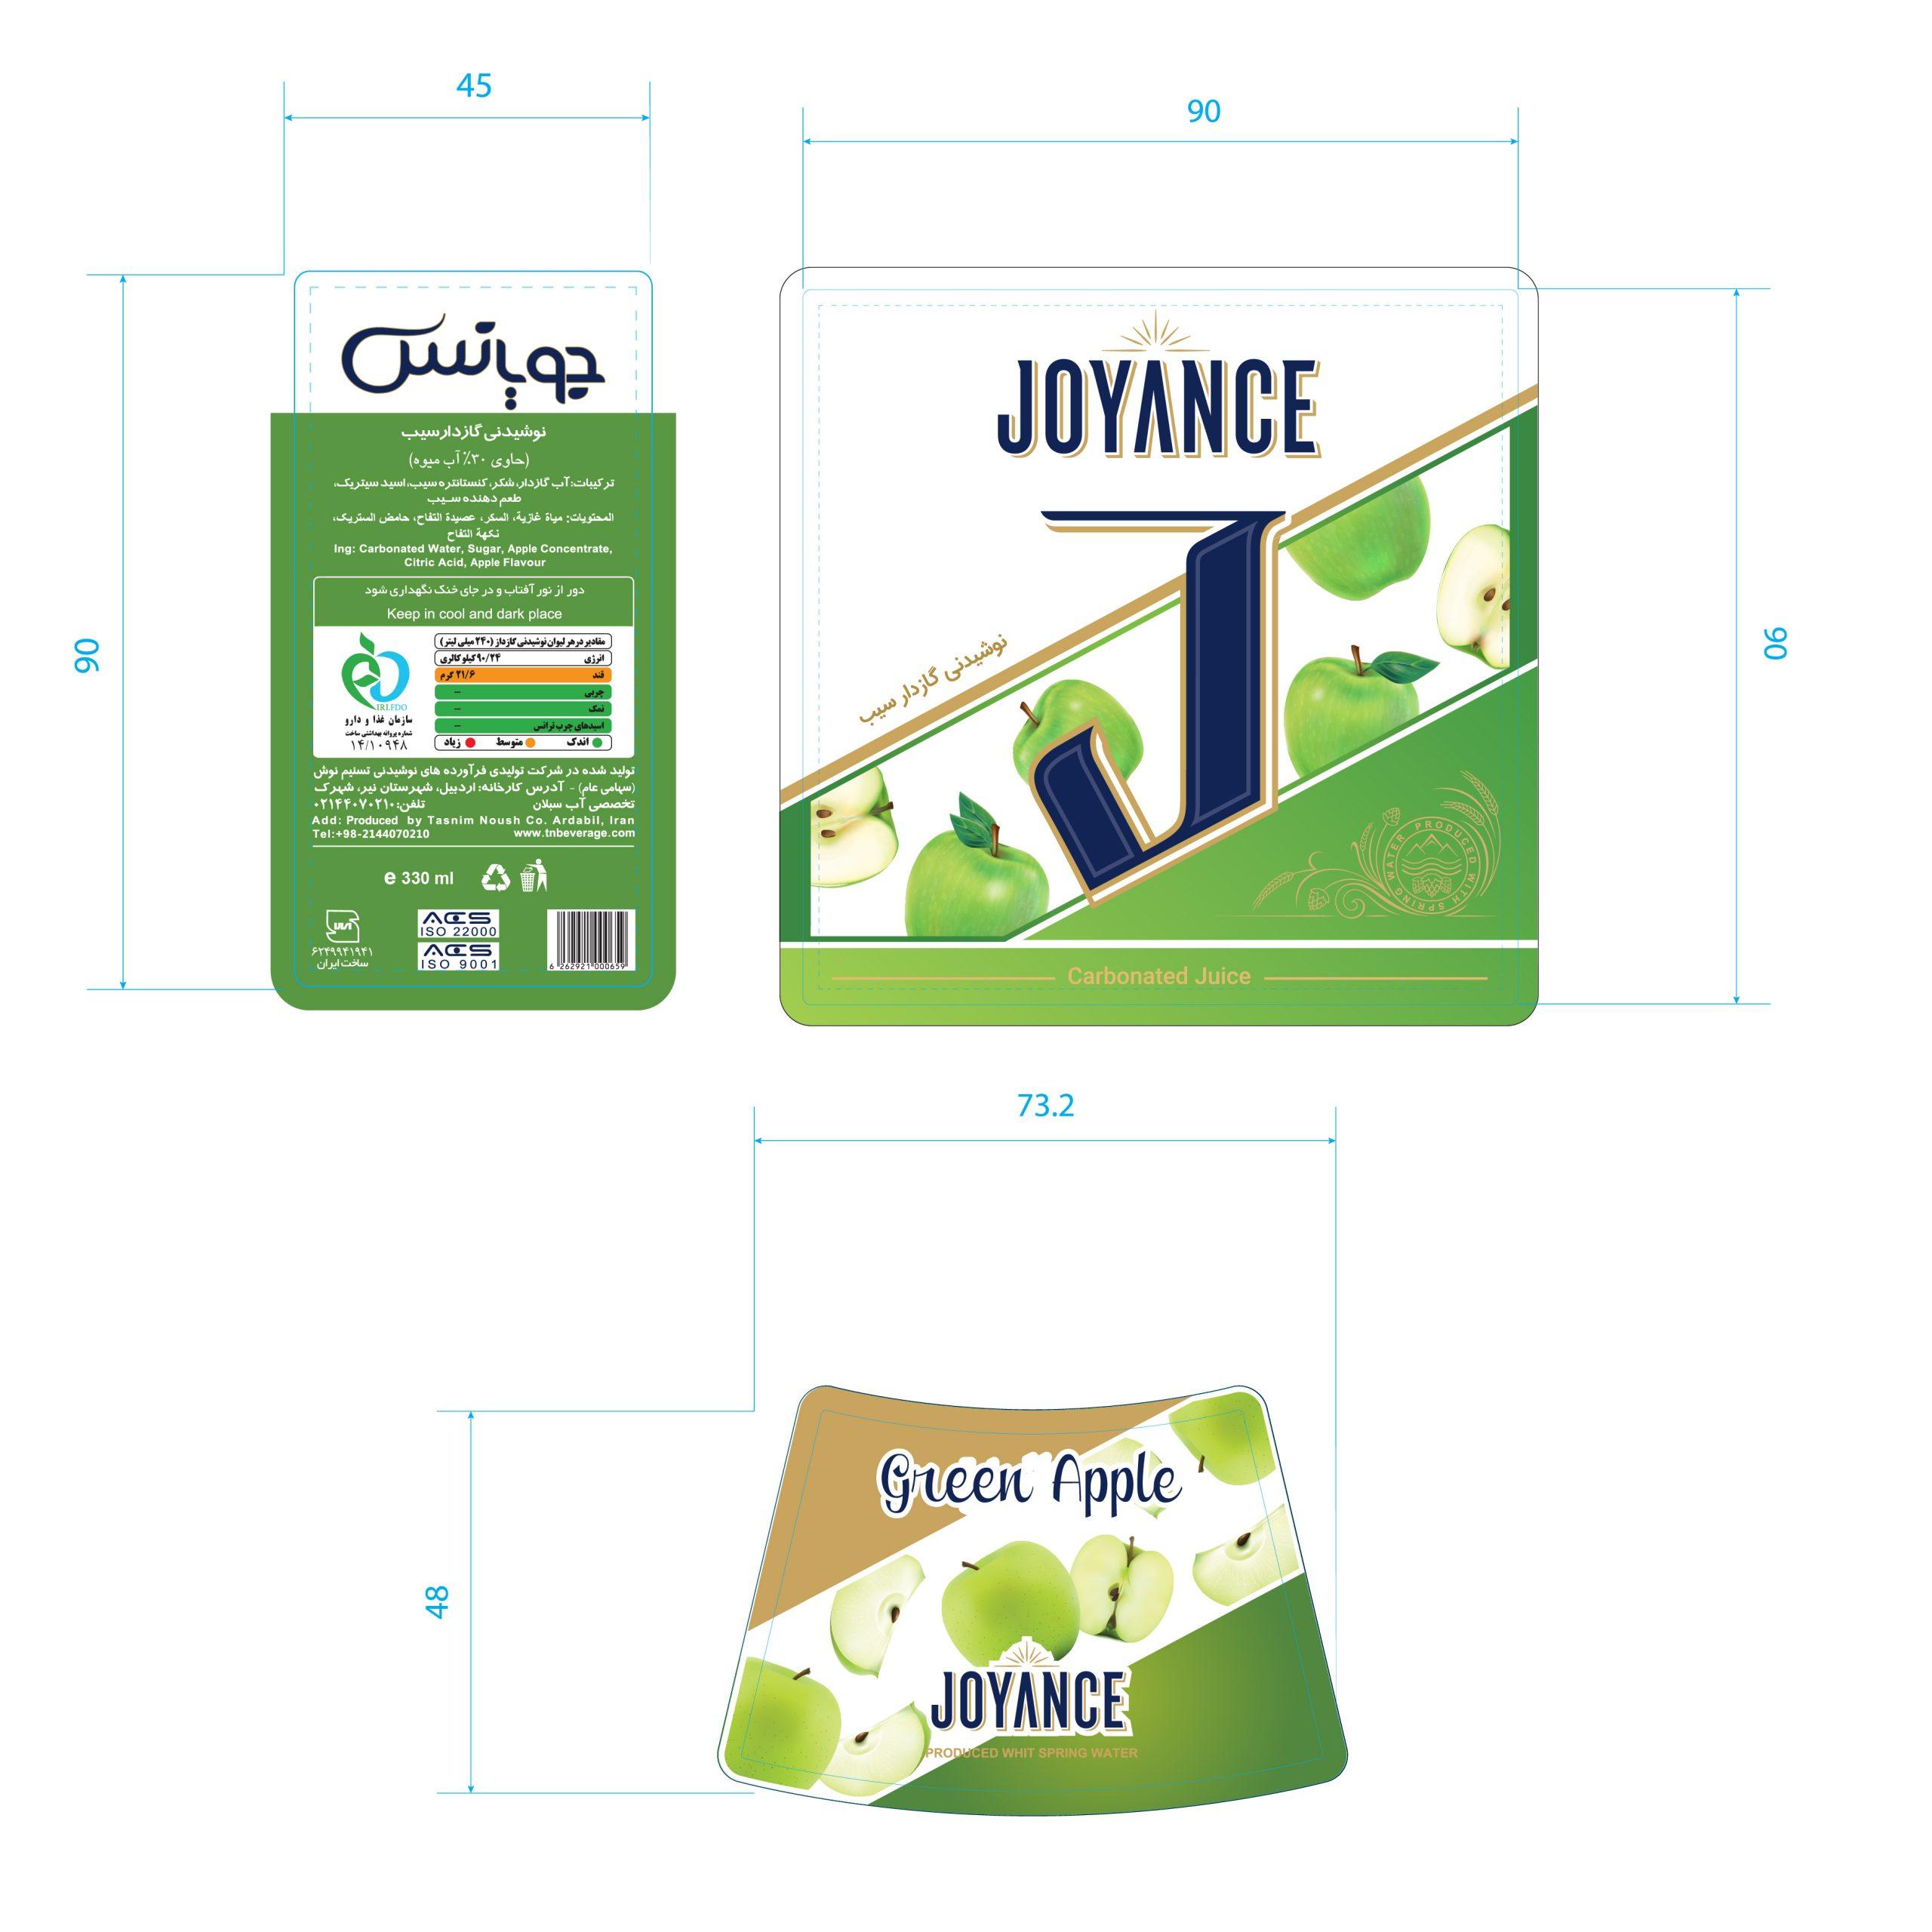 juyance - insta-07